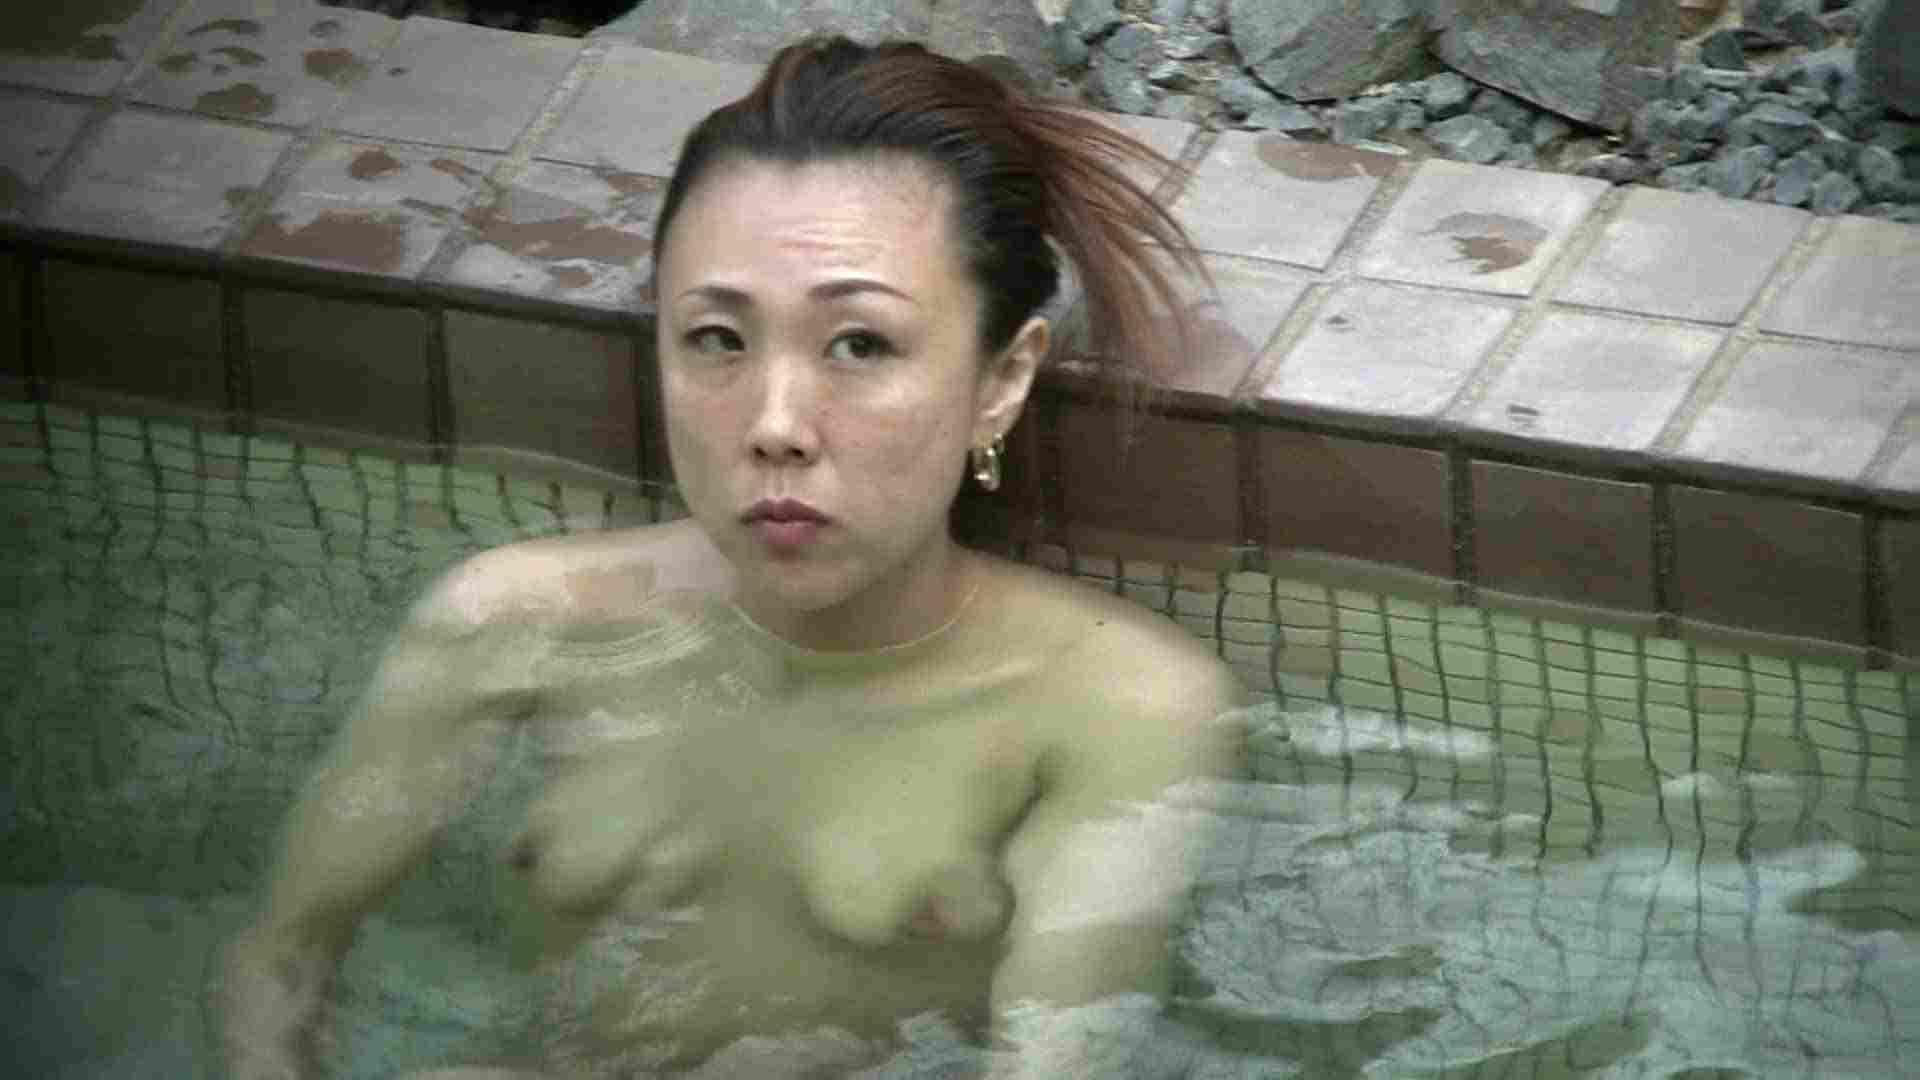 Aquaな露天風呂Vol.654 女体盗撮   OL女体  87連発 40